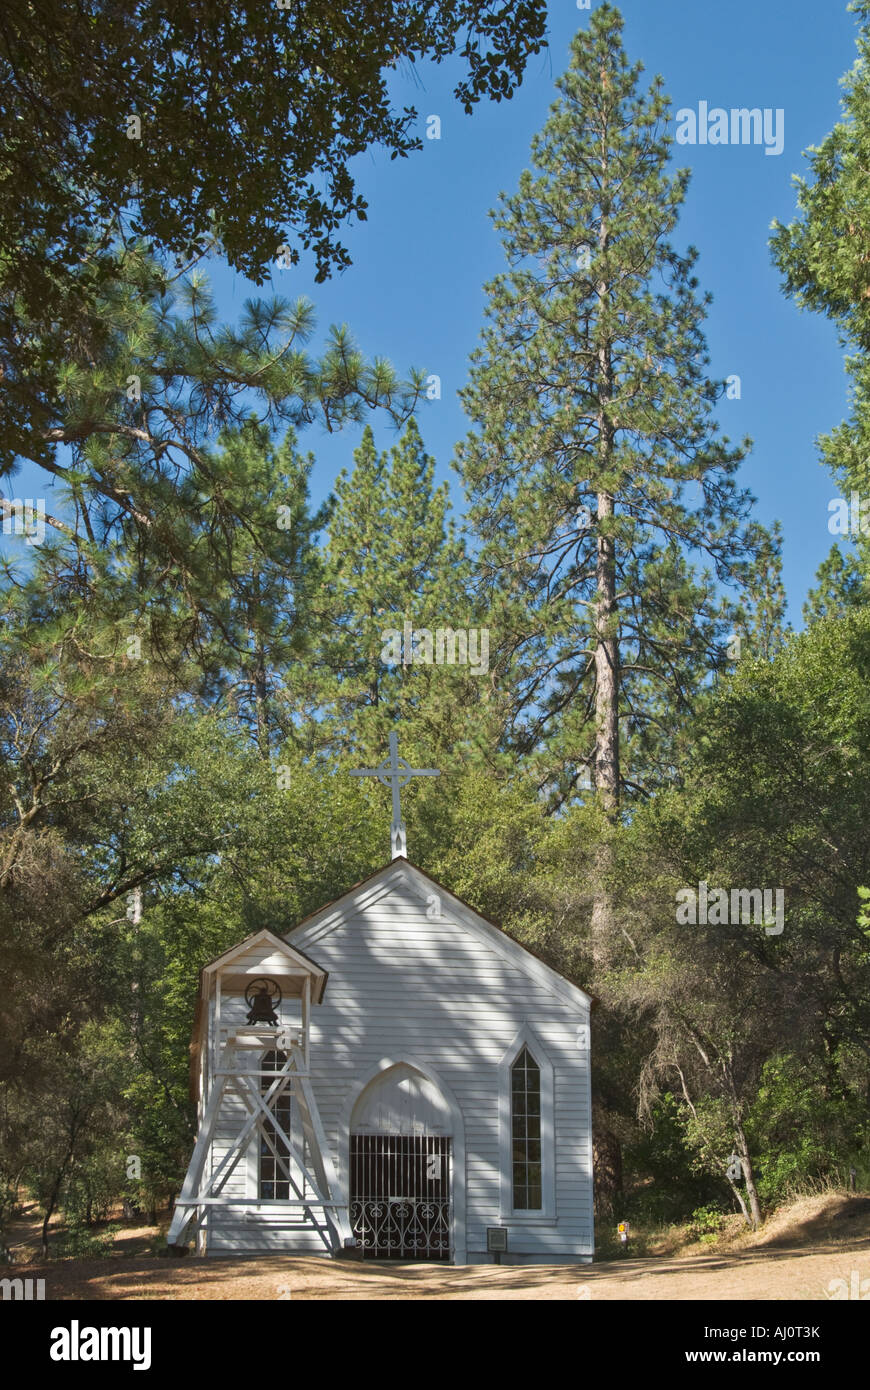 California Gold Country Coloma Marshall Gold Discovery State Historic Park Saint John s Catholic Church built 1856 - Stock Image